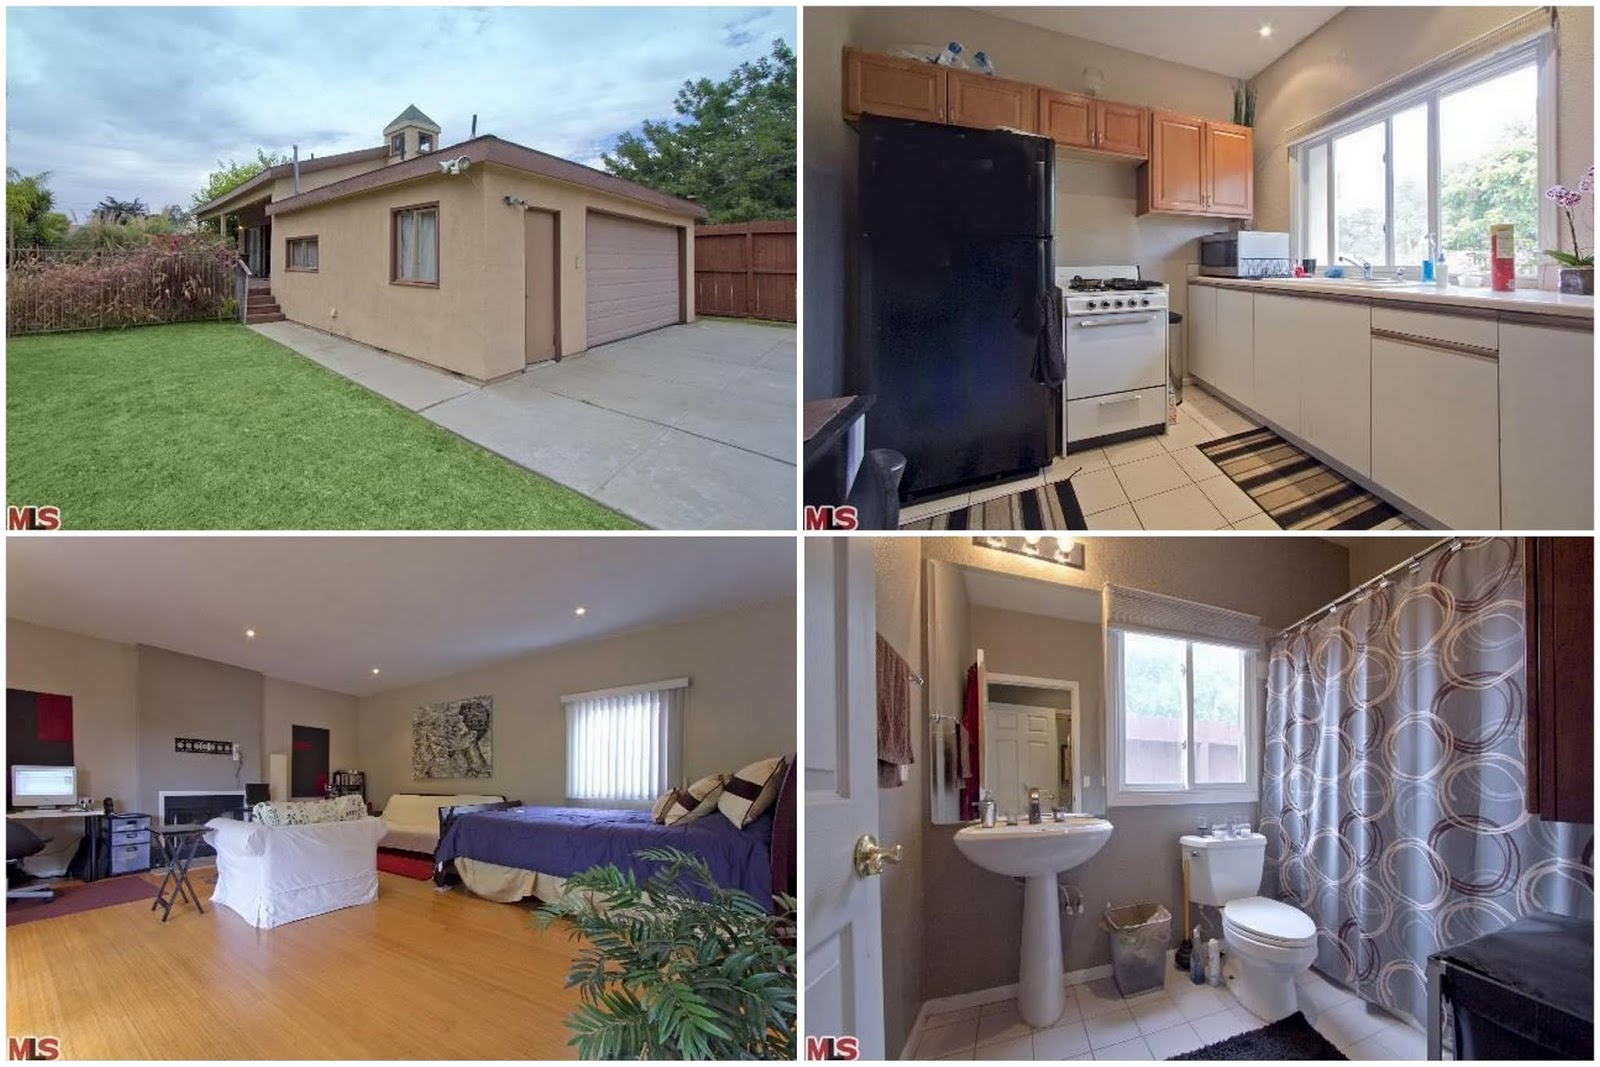 Real estate for sale in Atlanta Georgia - MLS# 6519934 ...